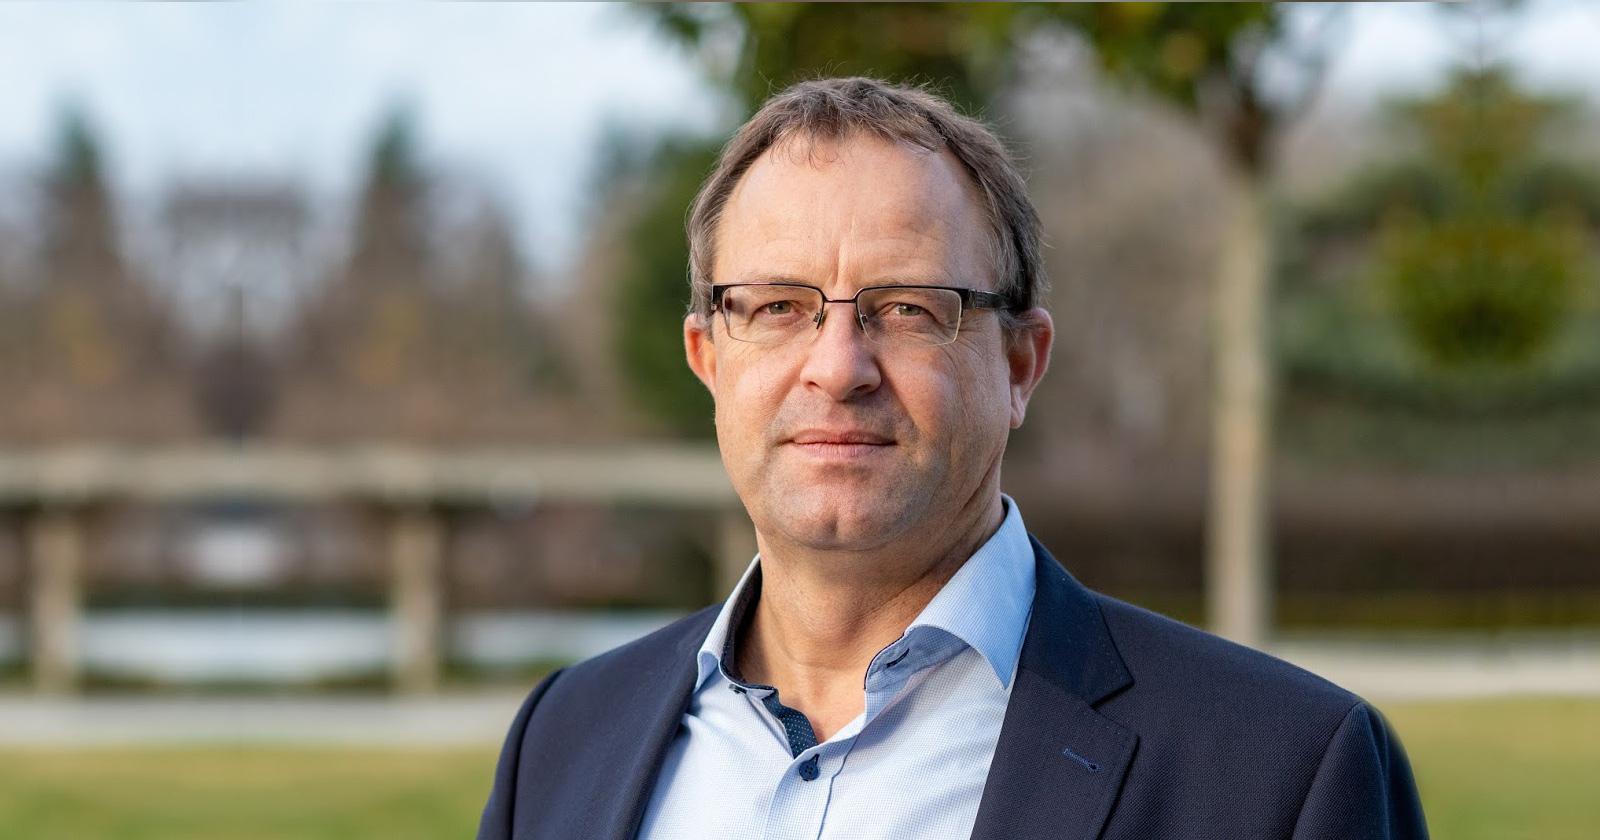 Dr. Jens Zimmermann